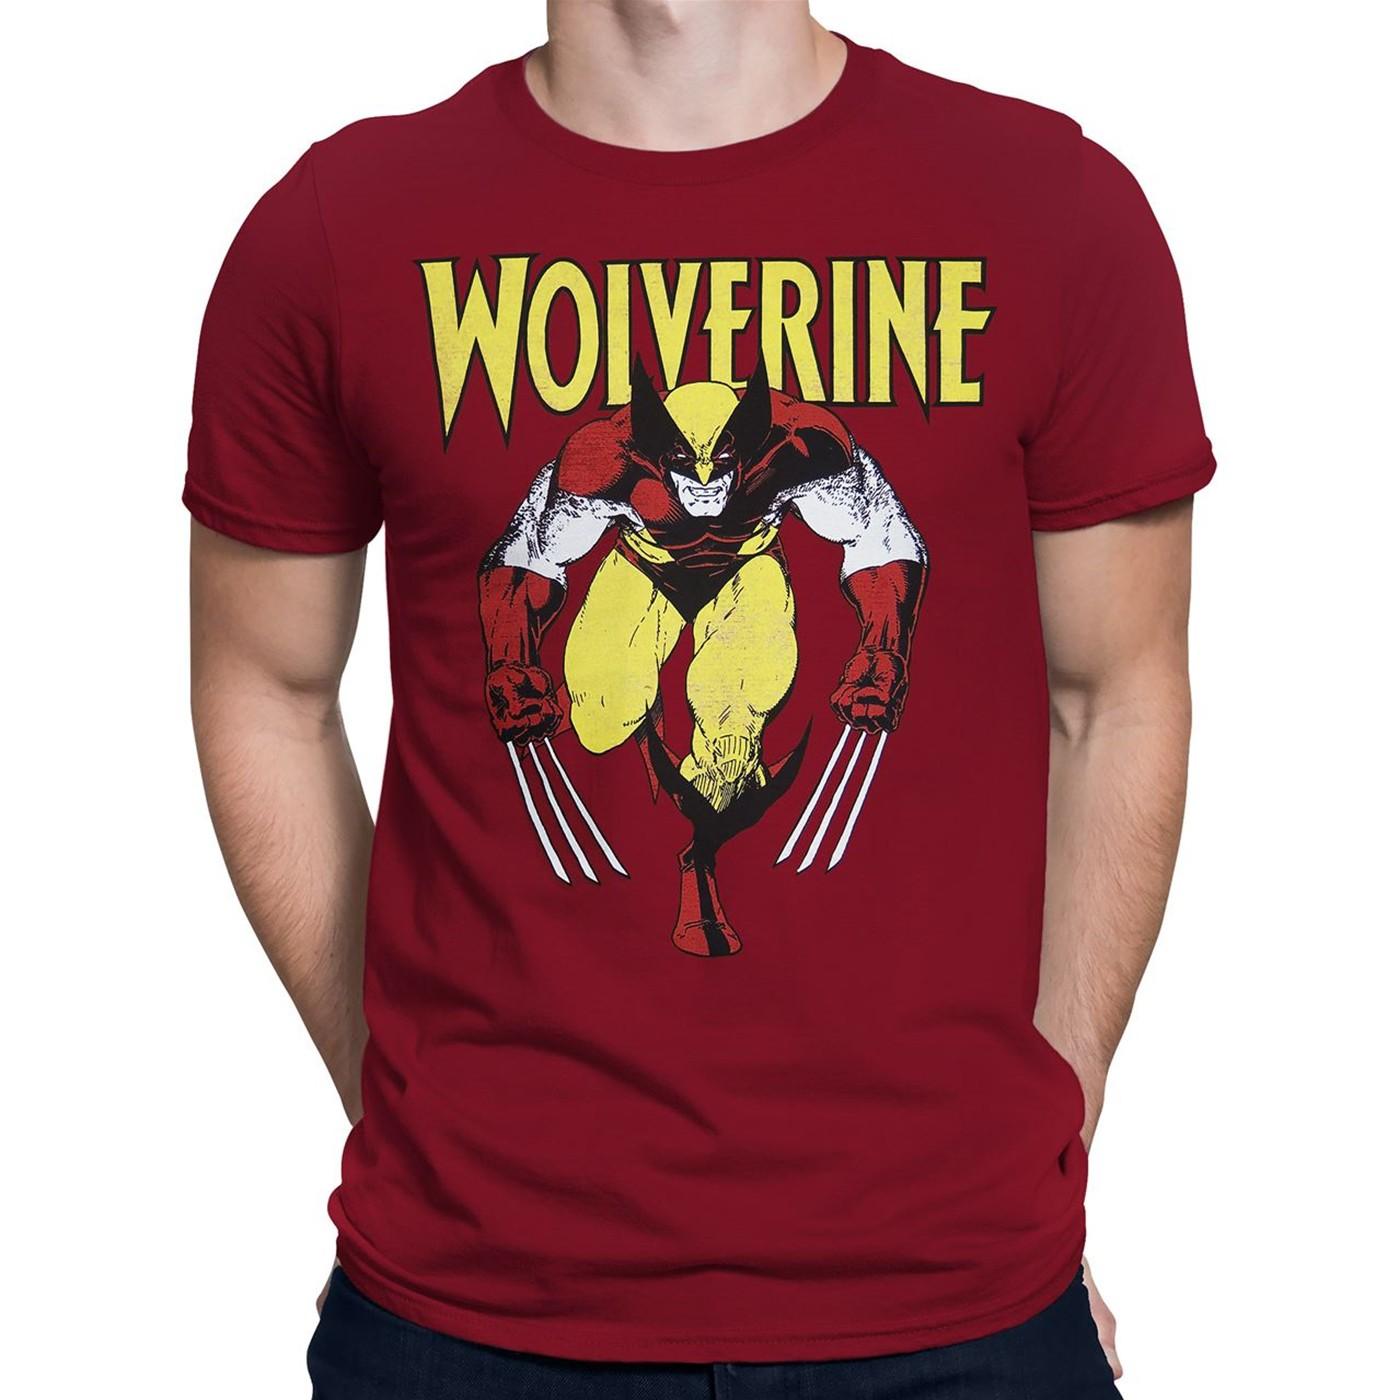 Wolverine Red Rage Distressed T-Shirt